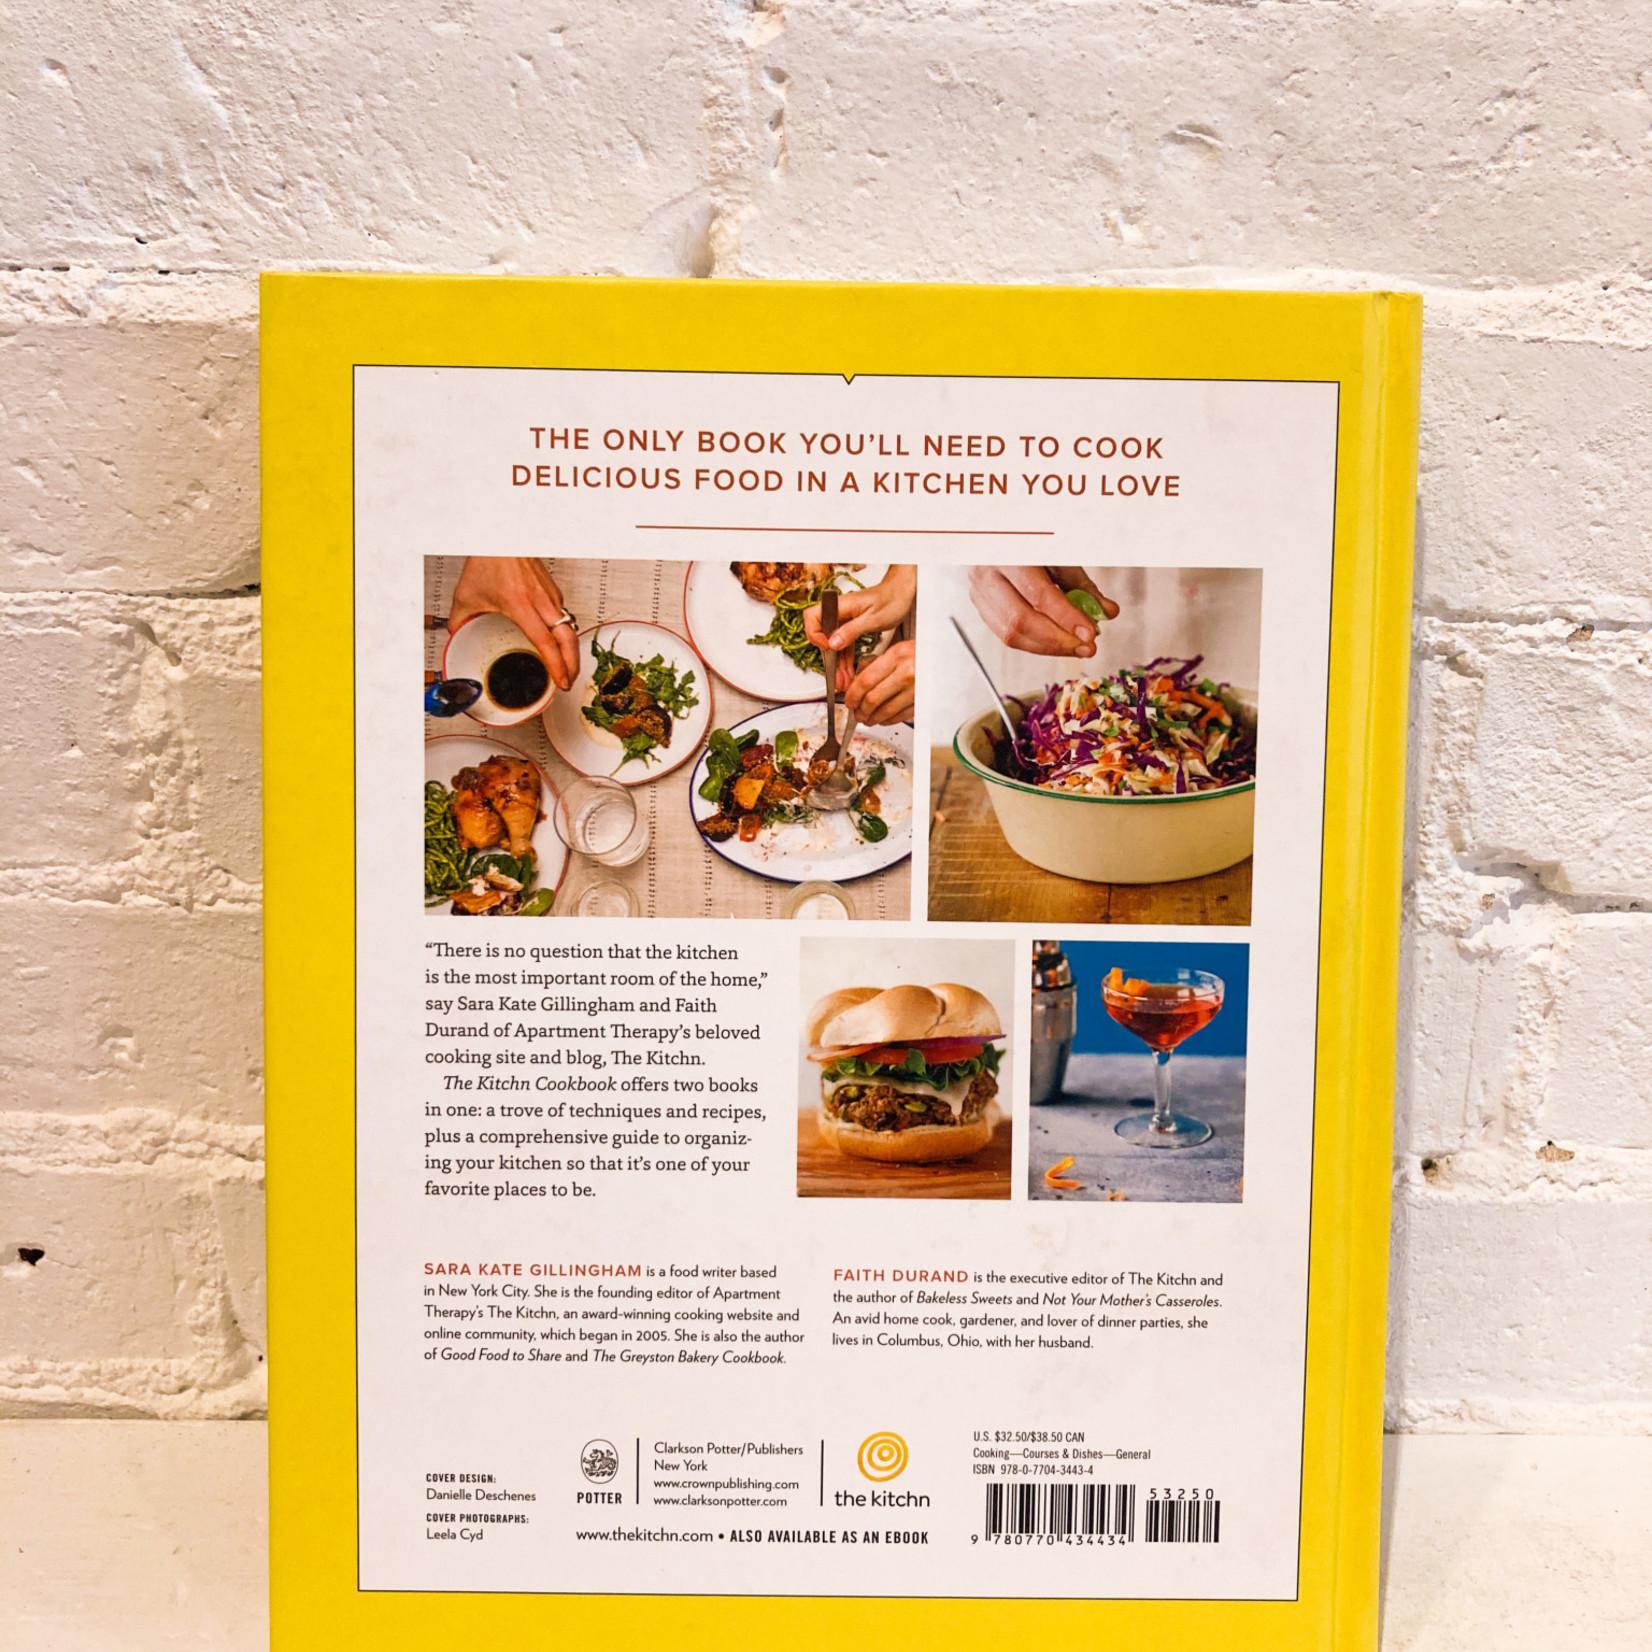 The Kitchn Cookbook by Sara Kate Gillingham & Faith Durand